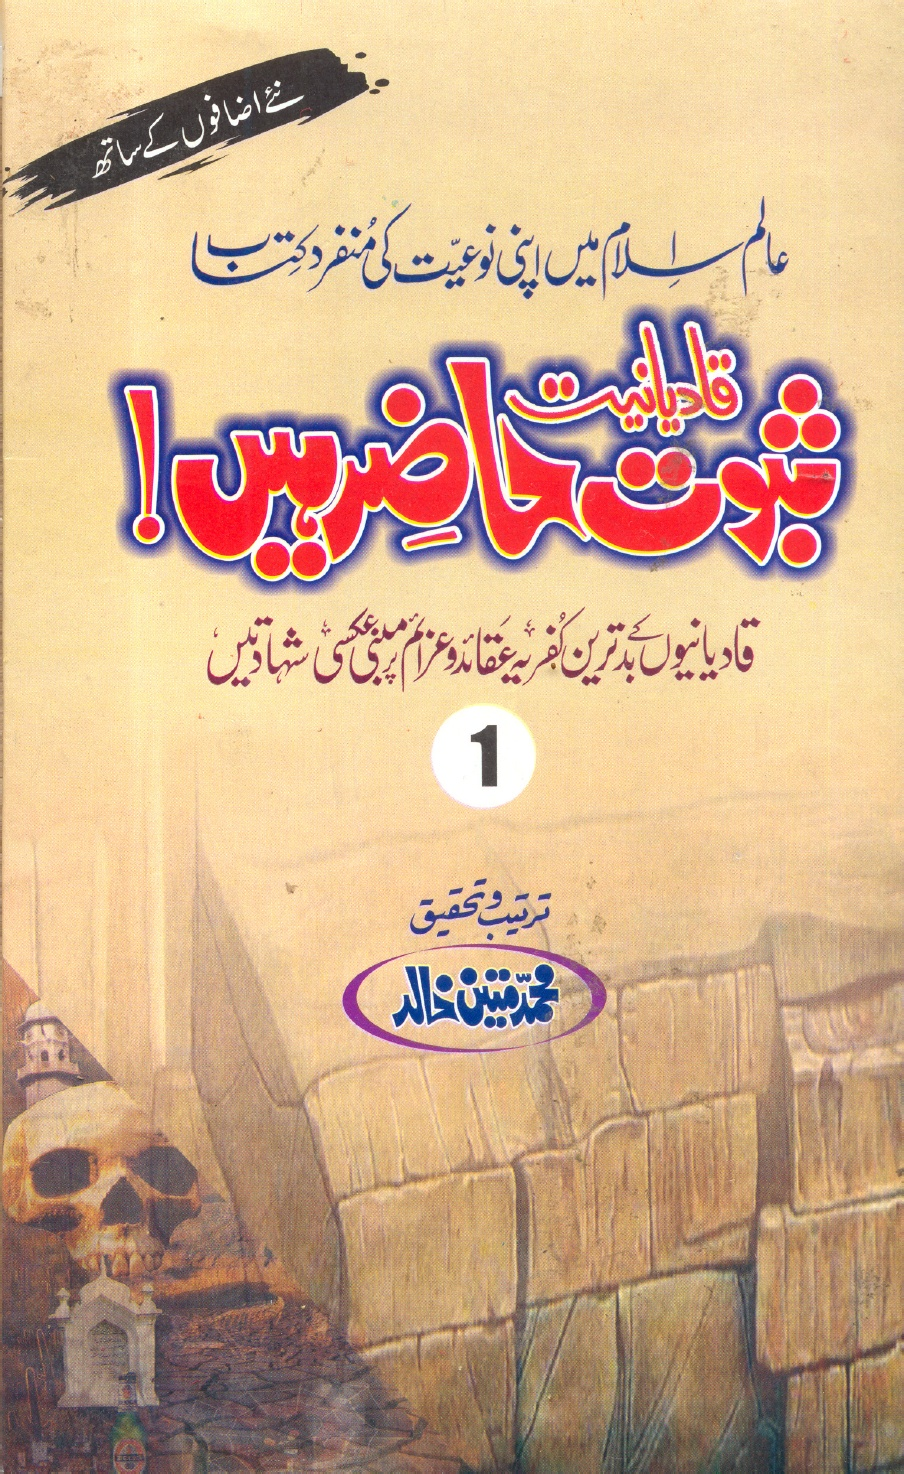 Qadianiat Saboot Hazir Hain J 1